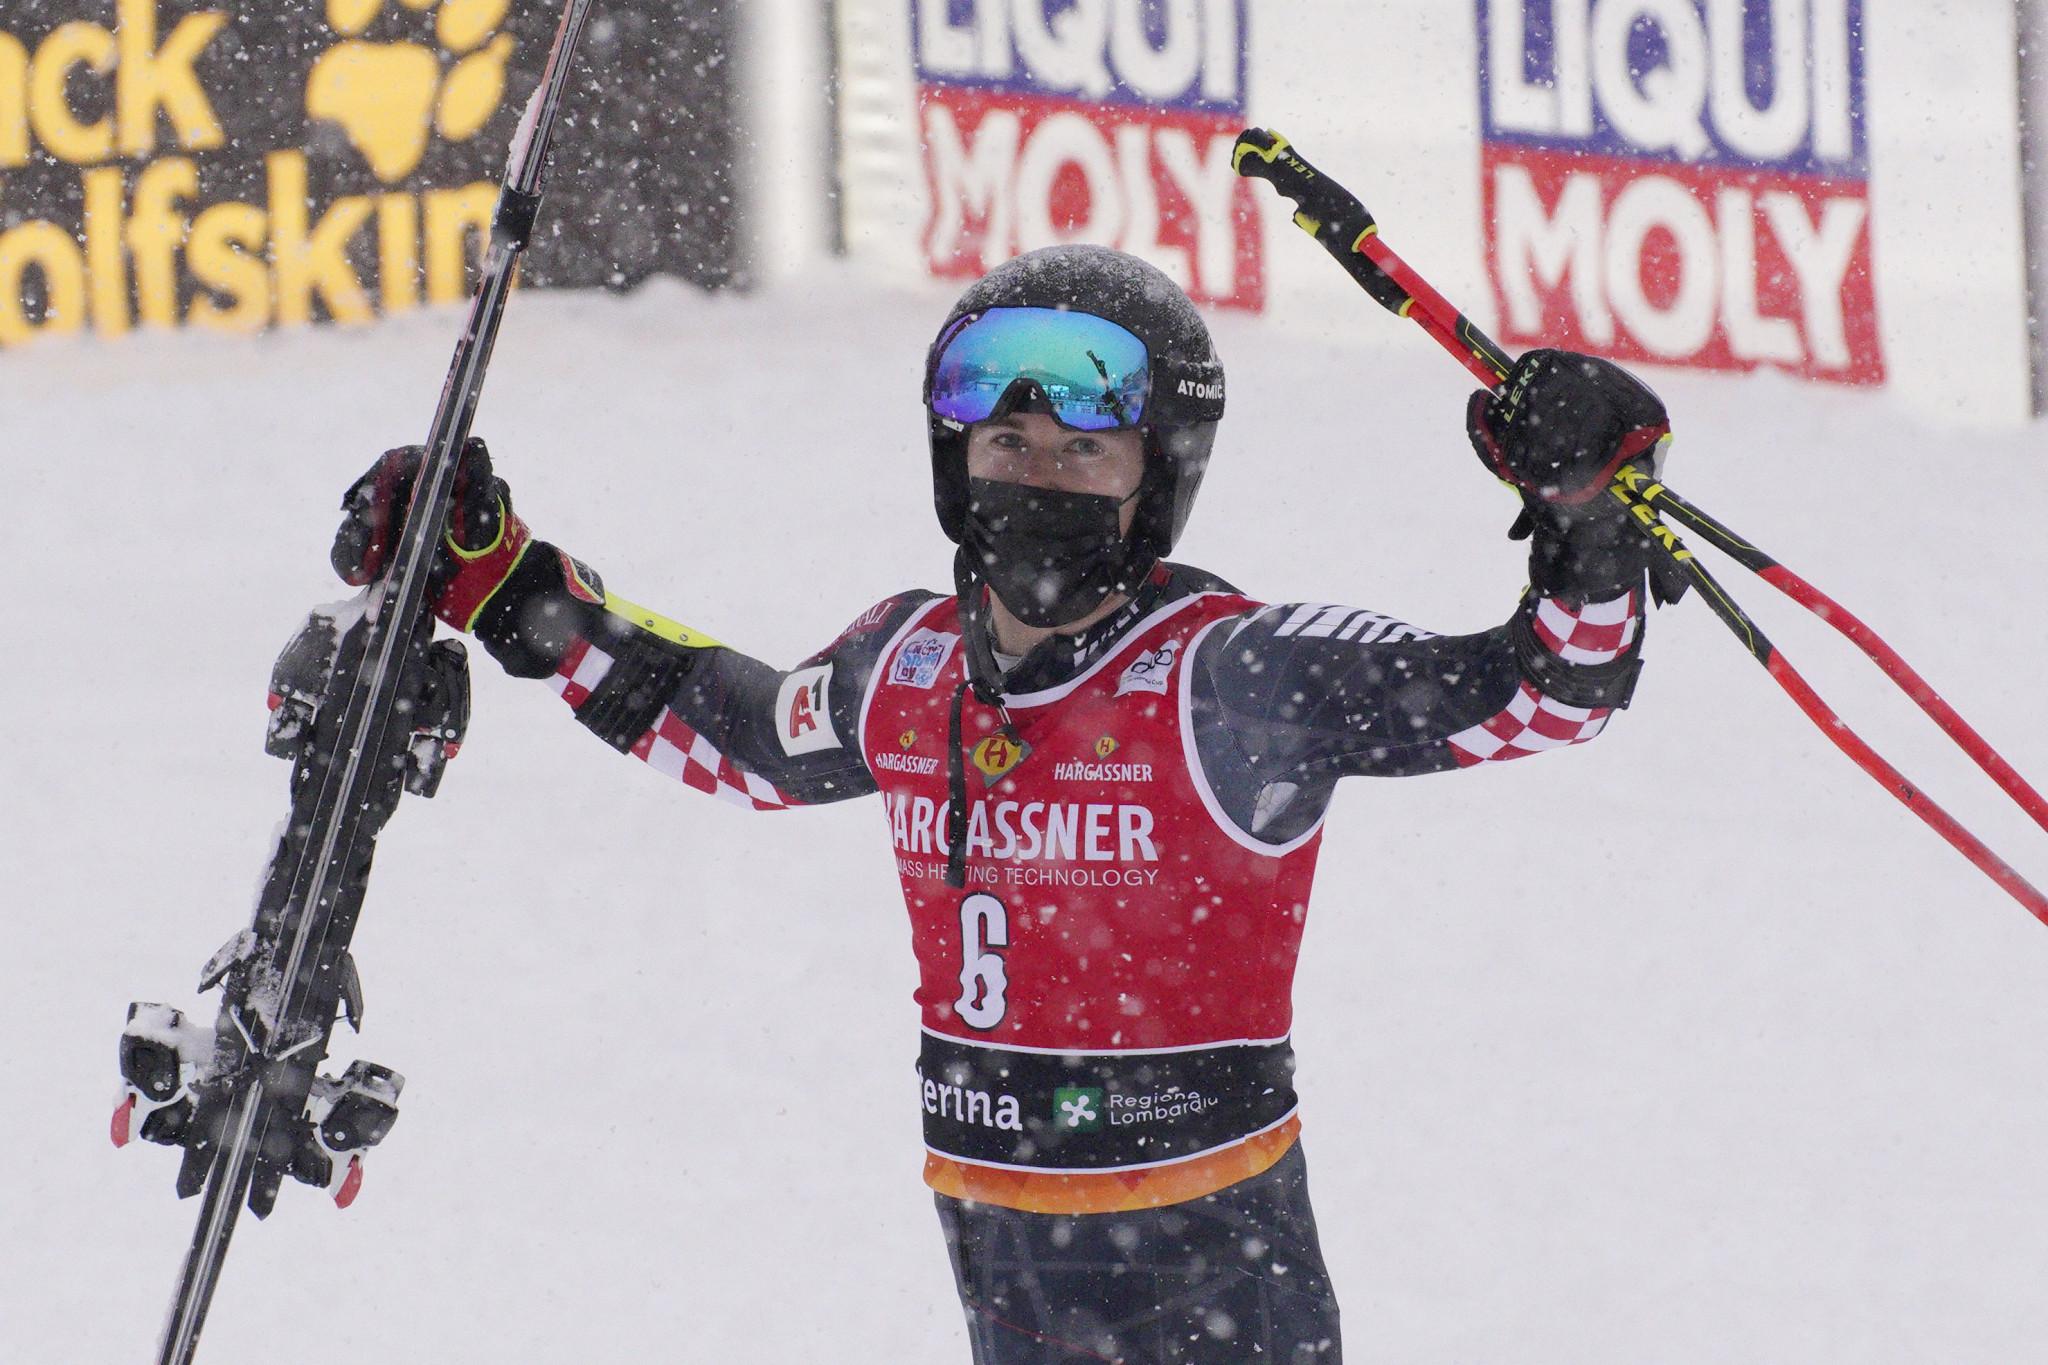 Zubčić fights back in Santa Caterina to take World Cup giant slalom victory